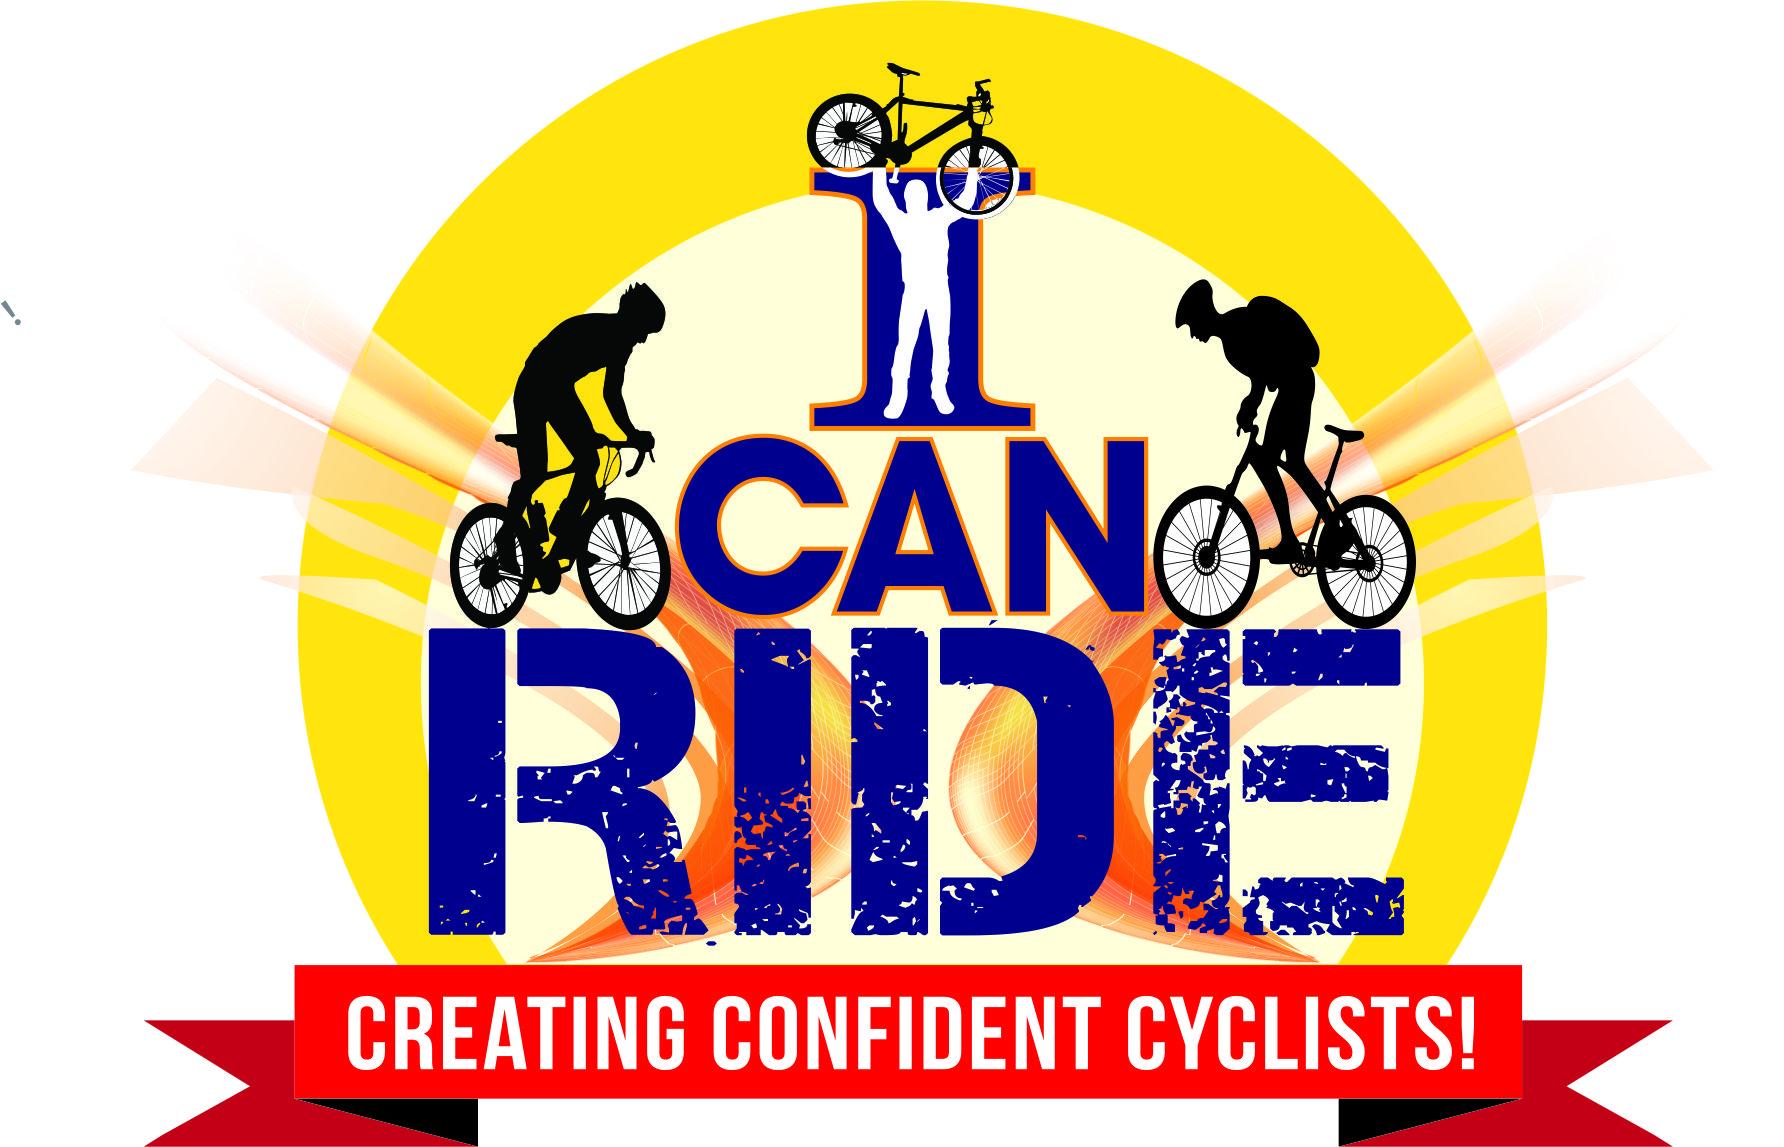 Book I Can Ride - Borivali - 10 Apr 2016 tickets, Mumbai | Explara.com